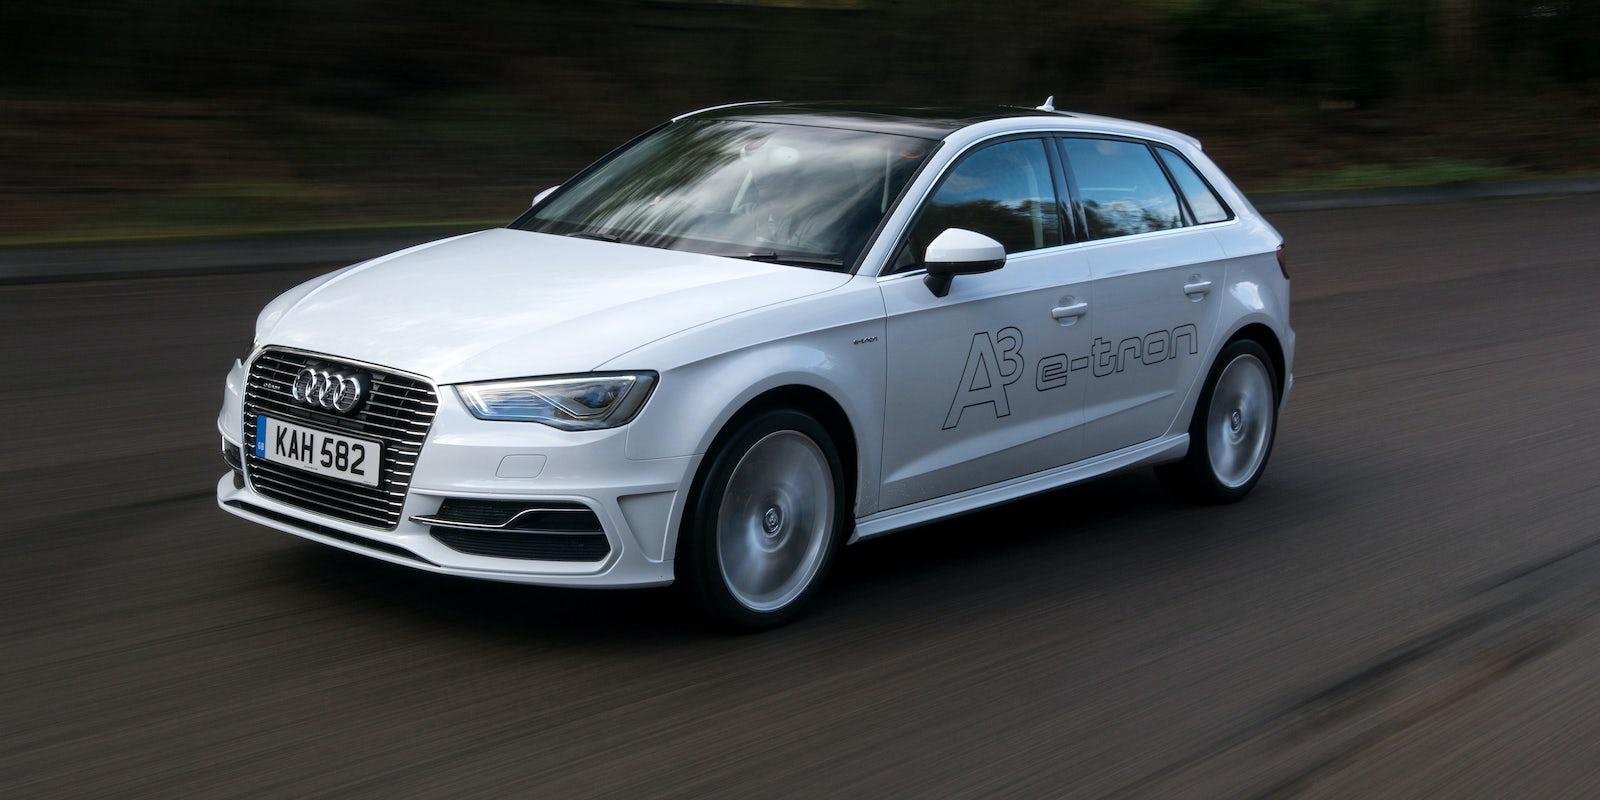 New Audi A Etron Review Carwow - Audi a 3 etron